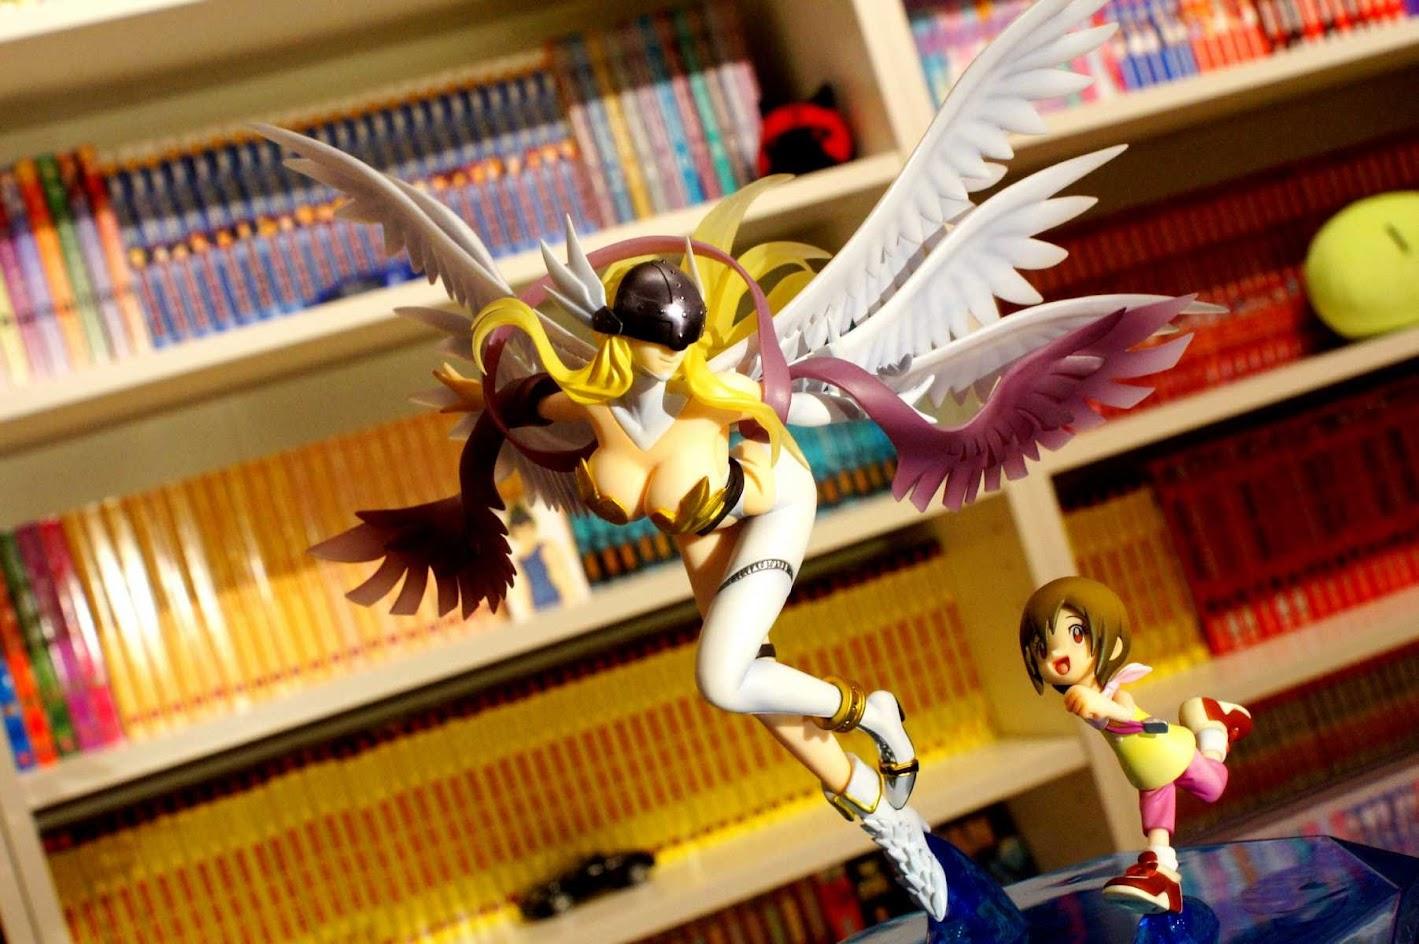 Digimon Adventure - Angewomon - Yagami Hikari - G.E.M. - 1/8 (MegaHouse)